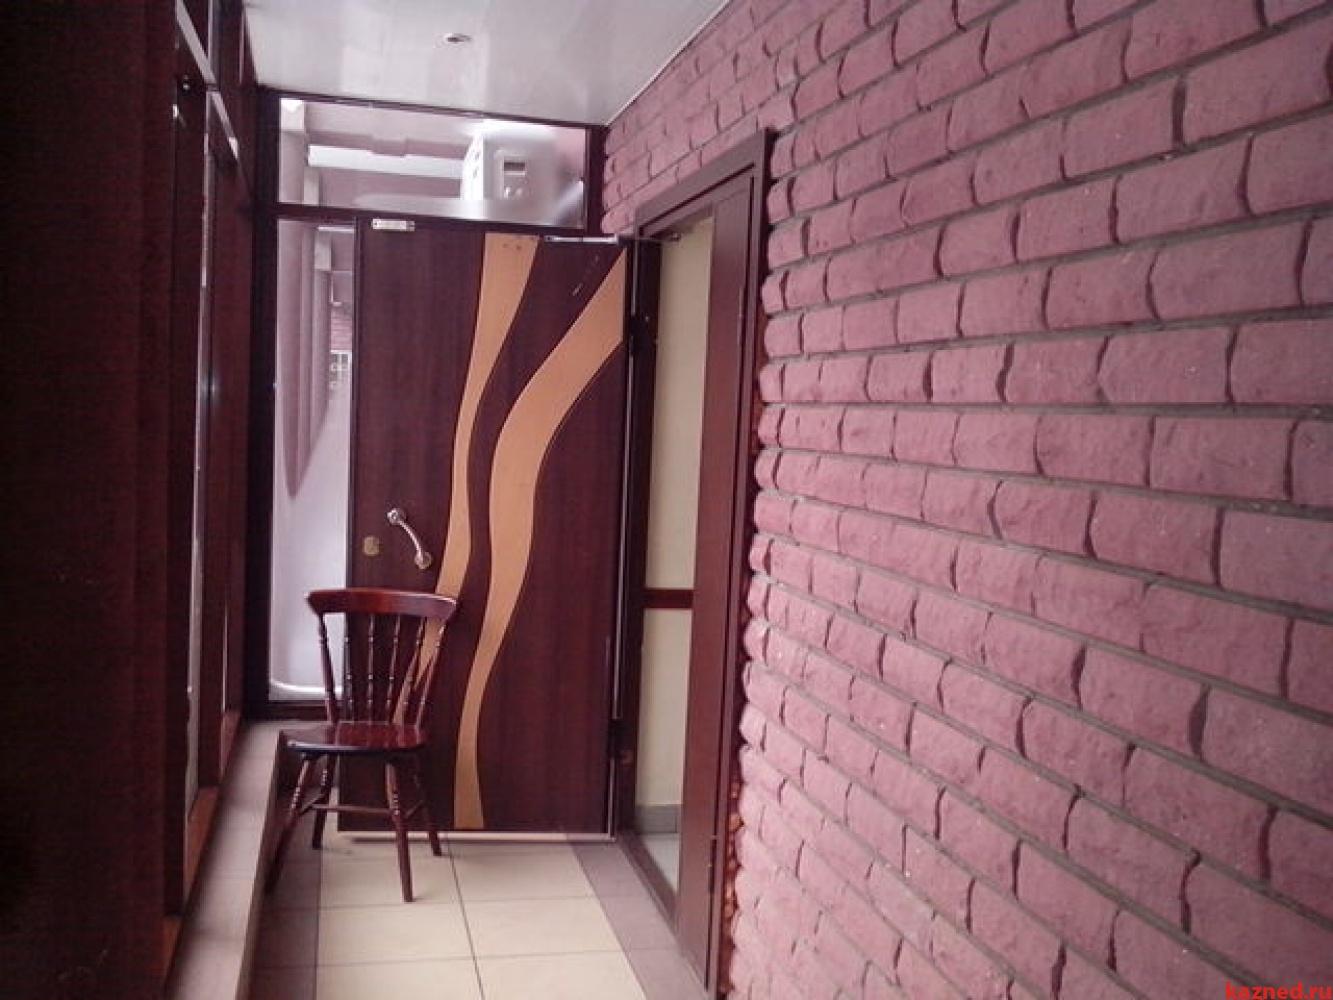 Продажа  Помещения свободного назначения пр. Ямашева, 158 м2  (миниатюра №7)